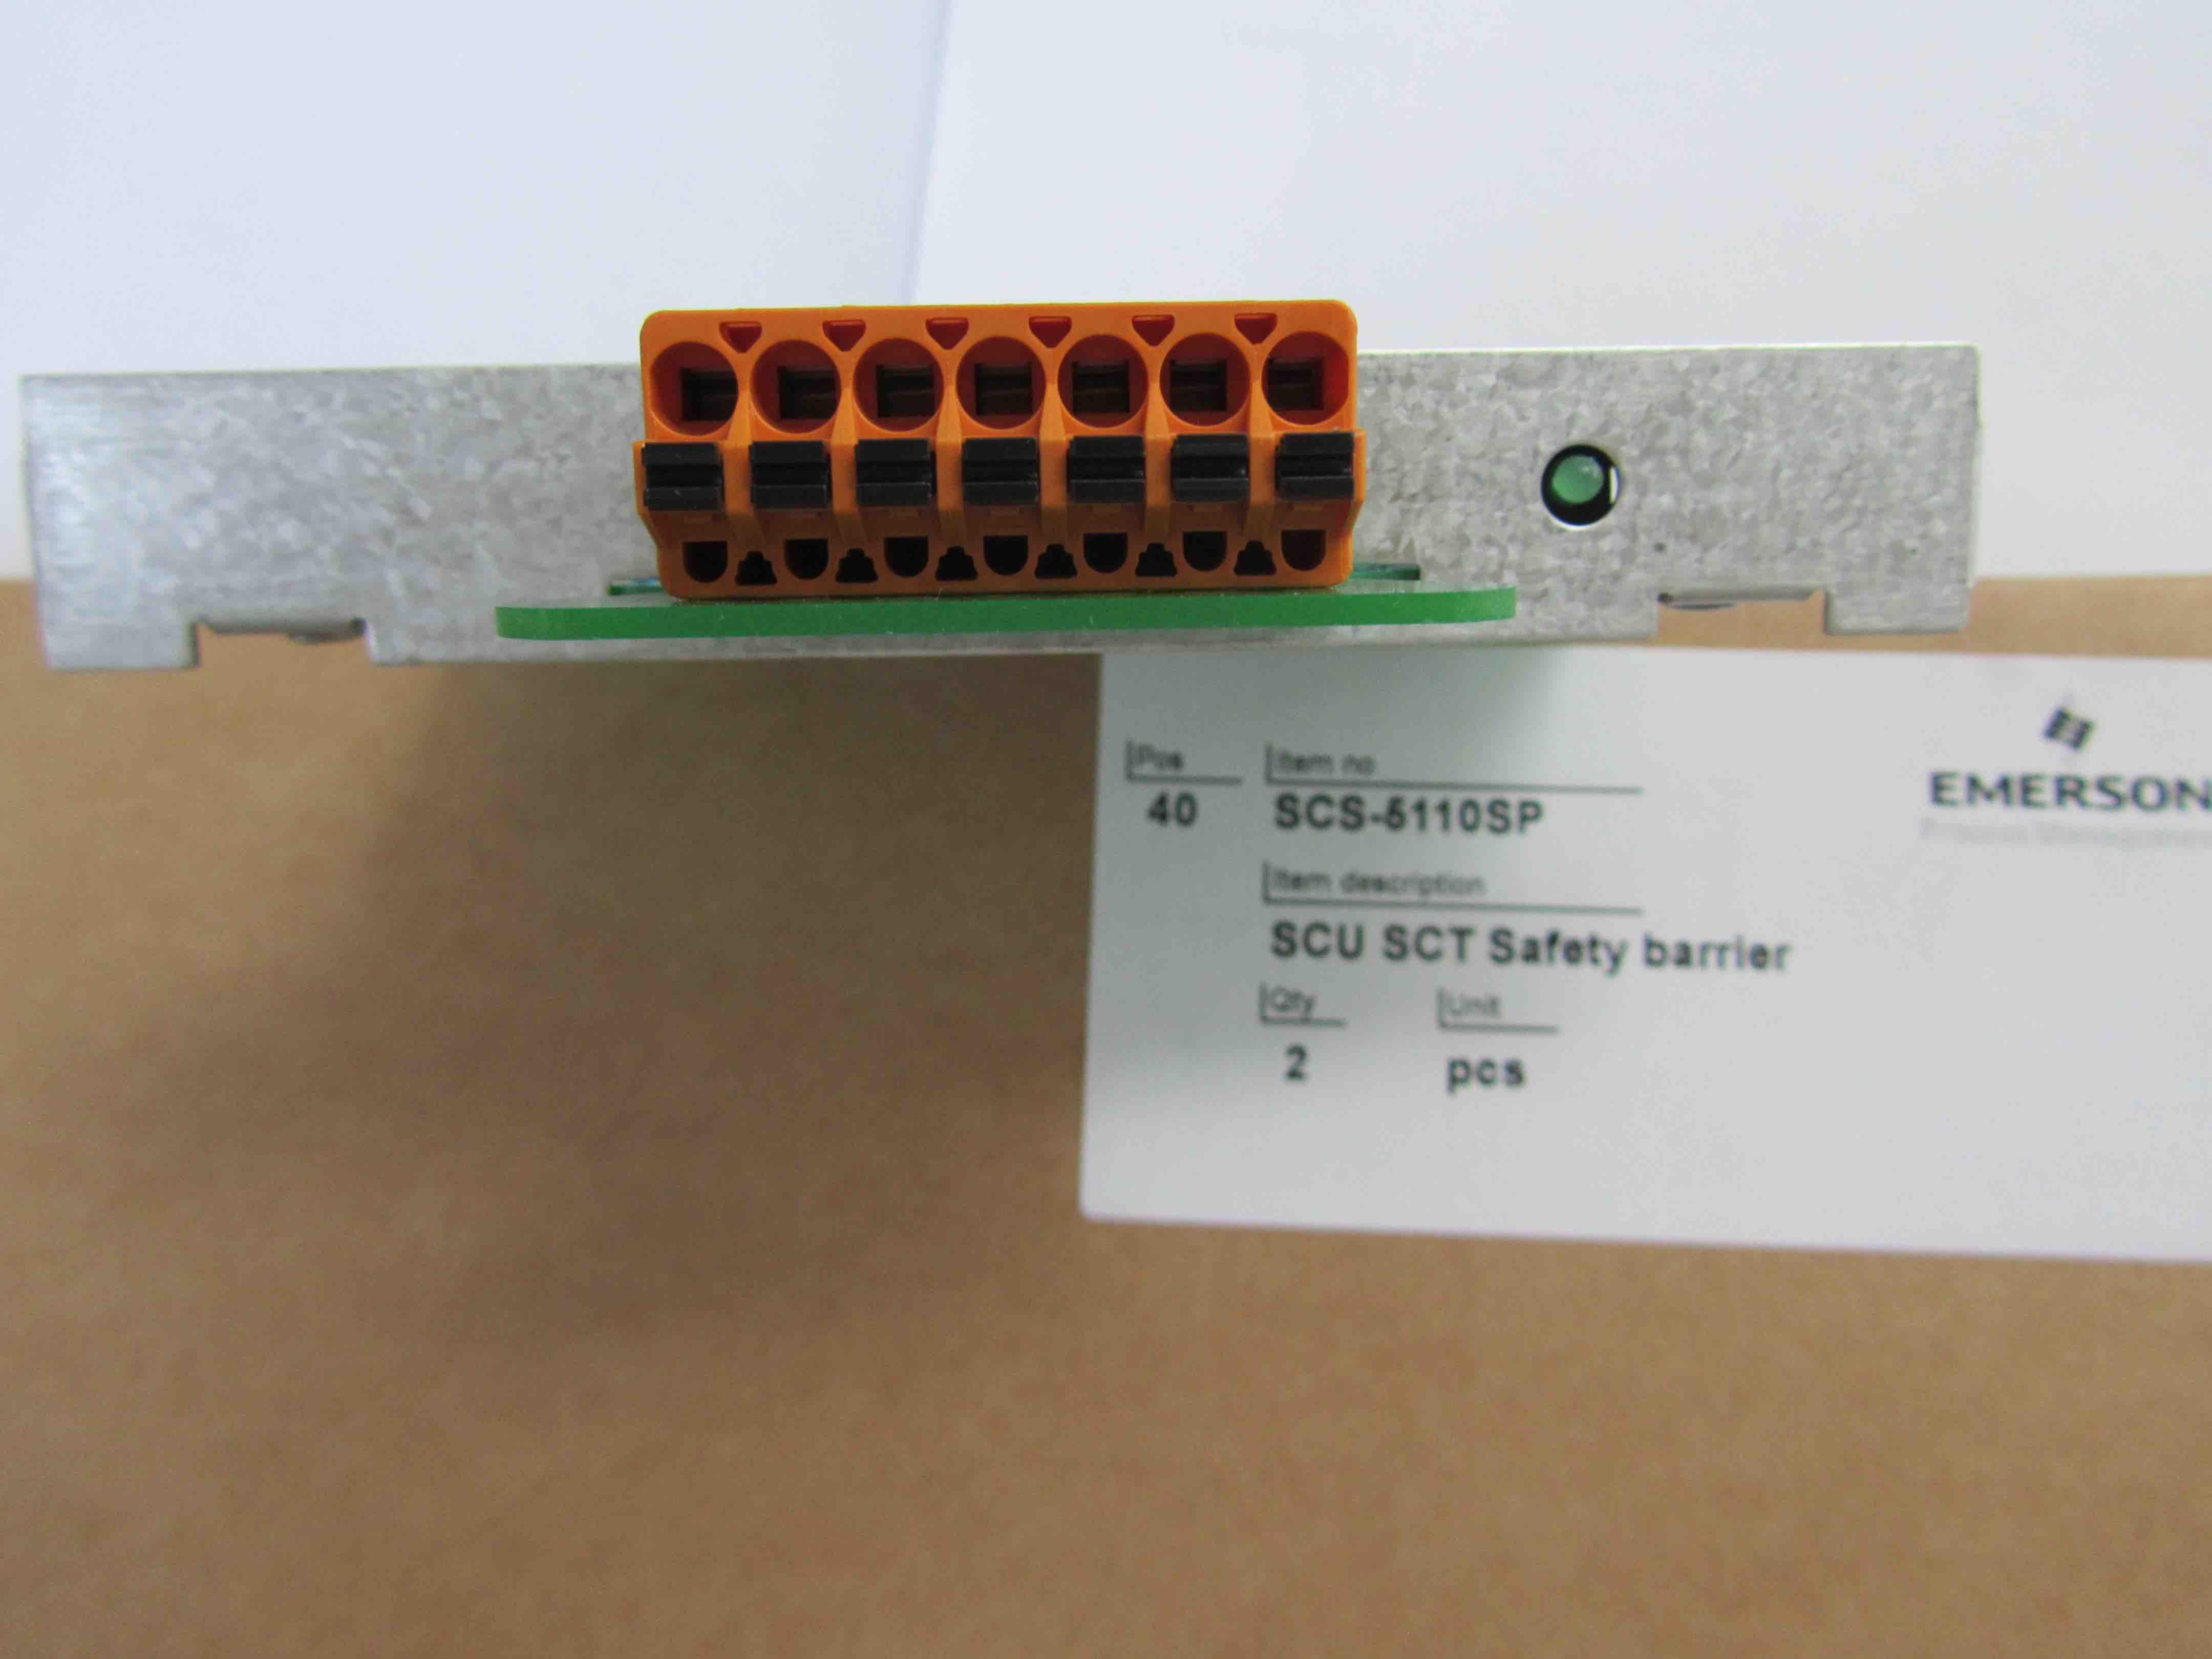 SCS-5110SP